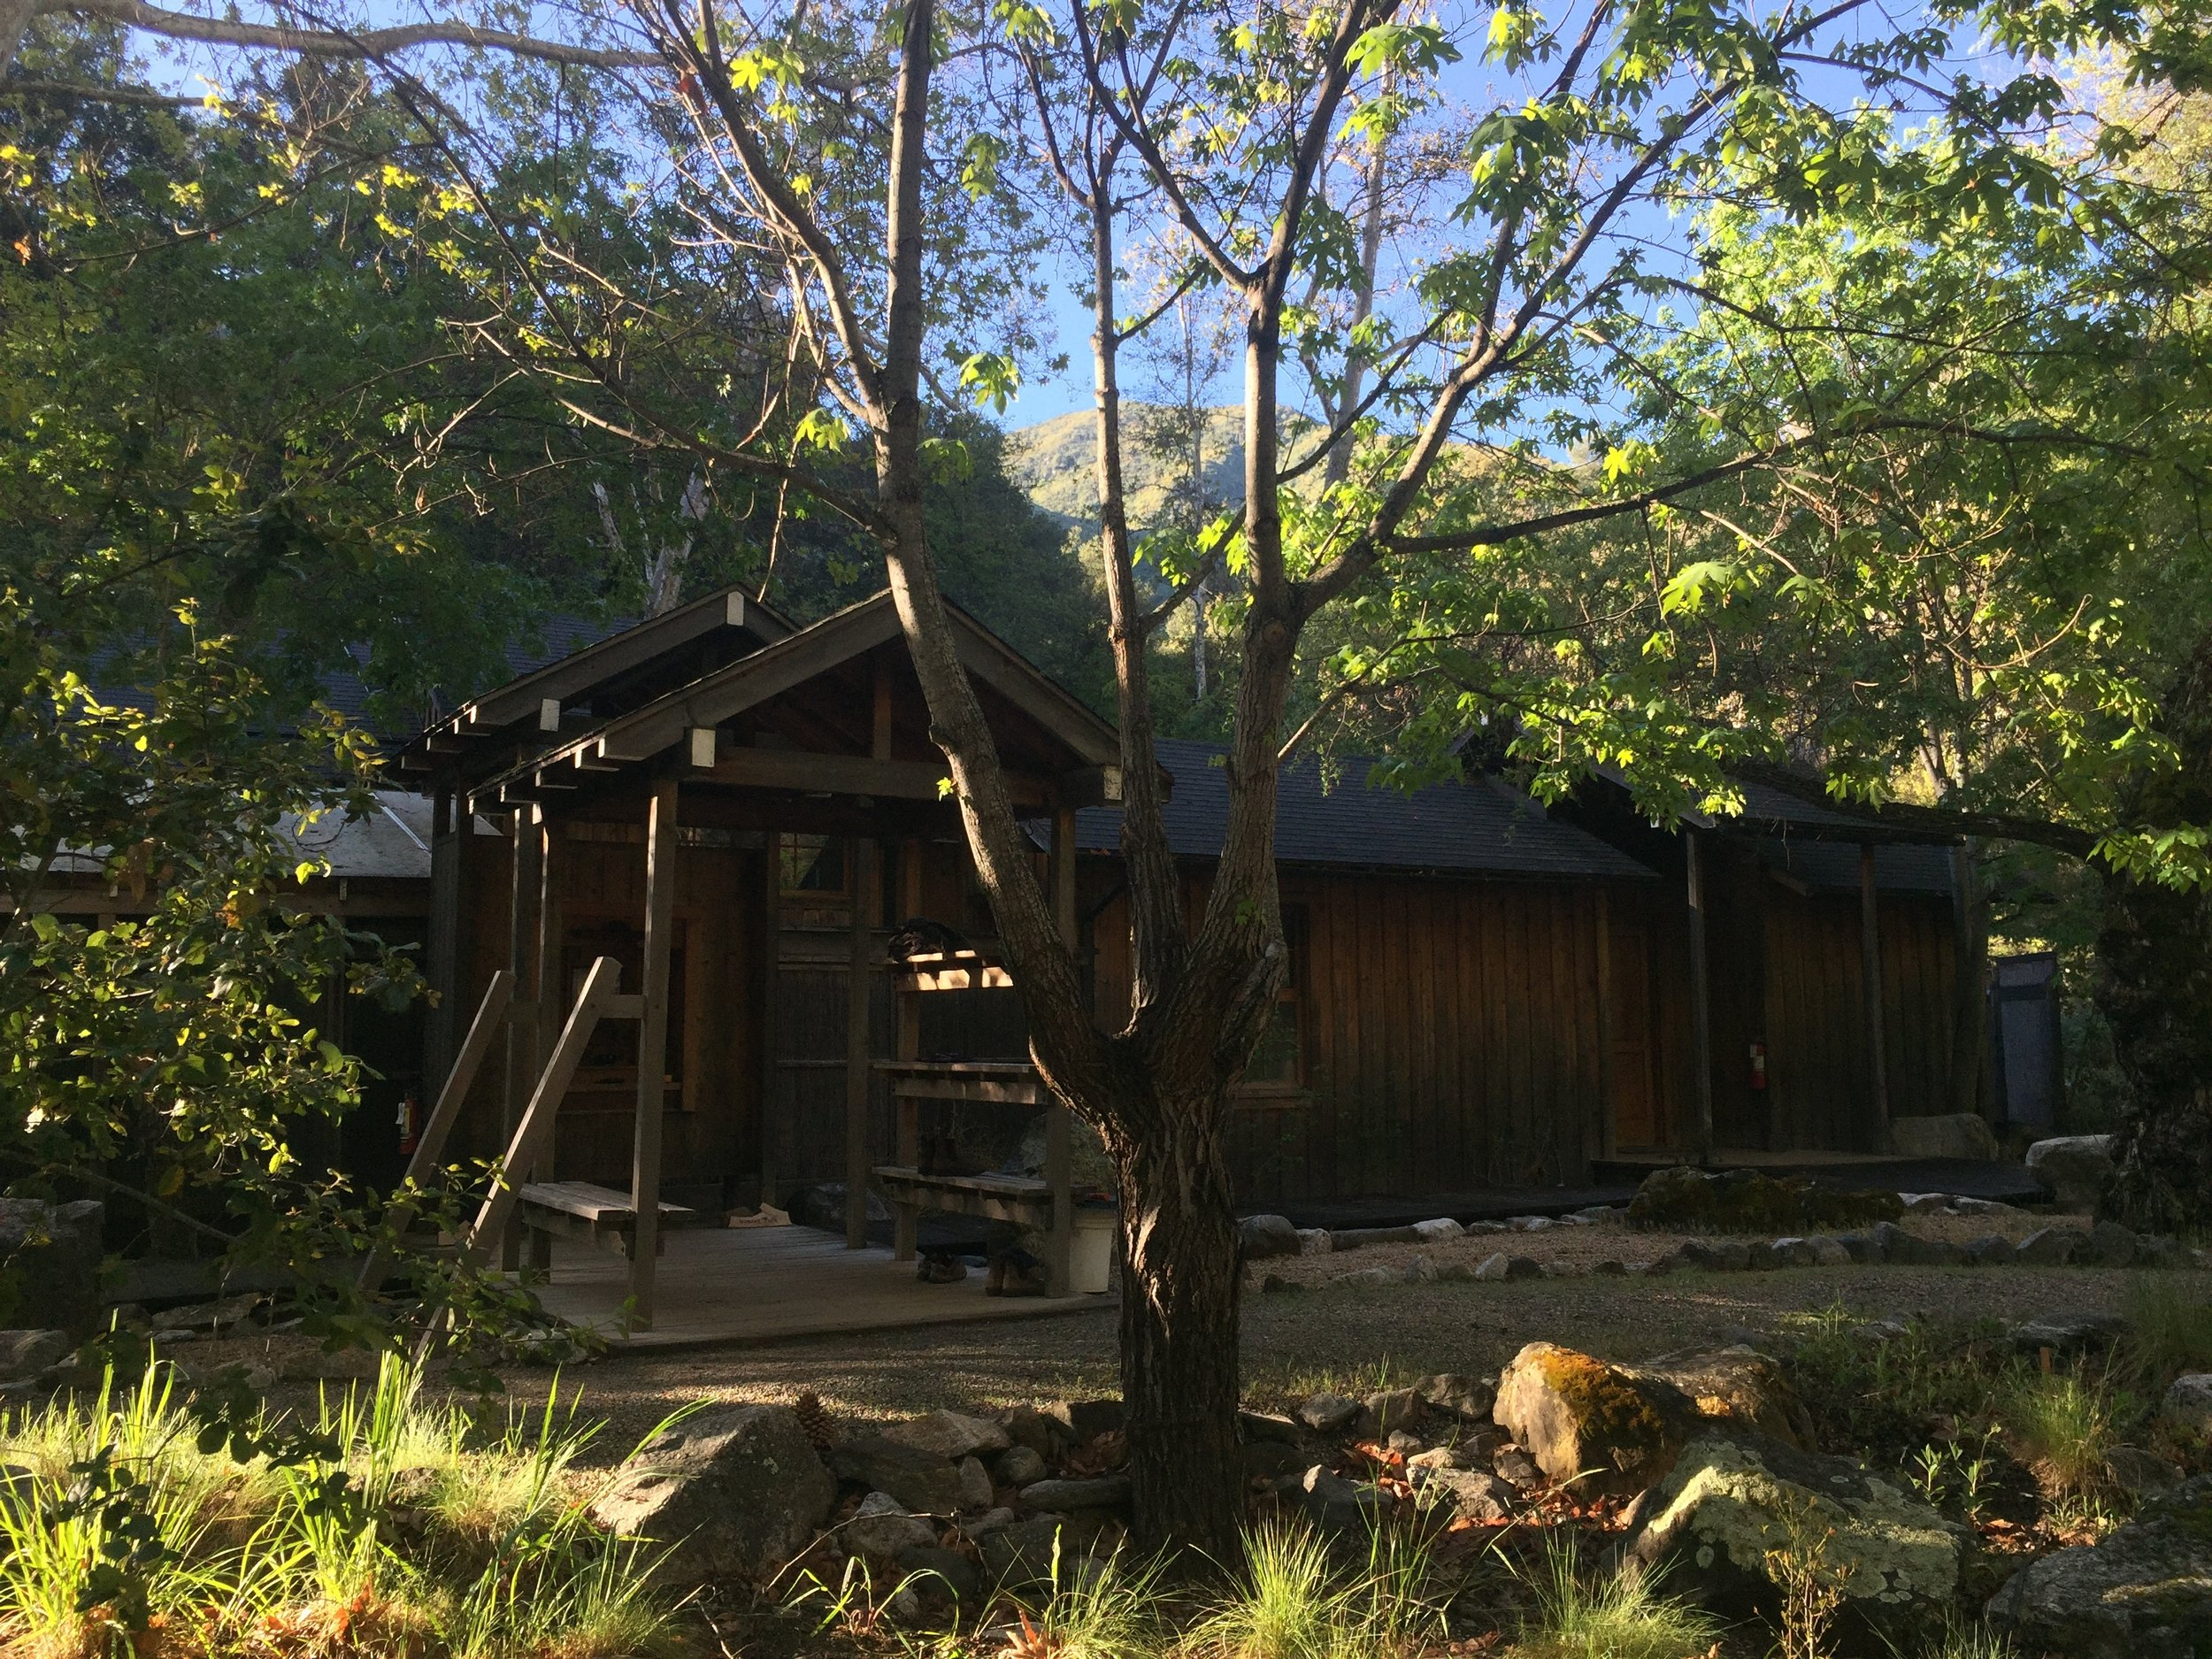 The bath house at Tassajara Zen Center.